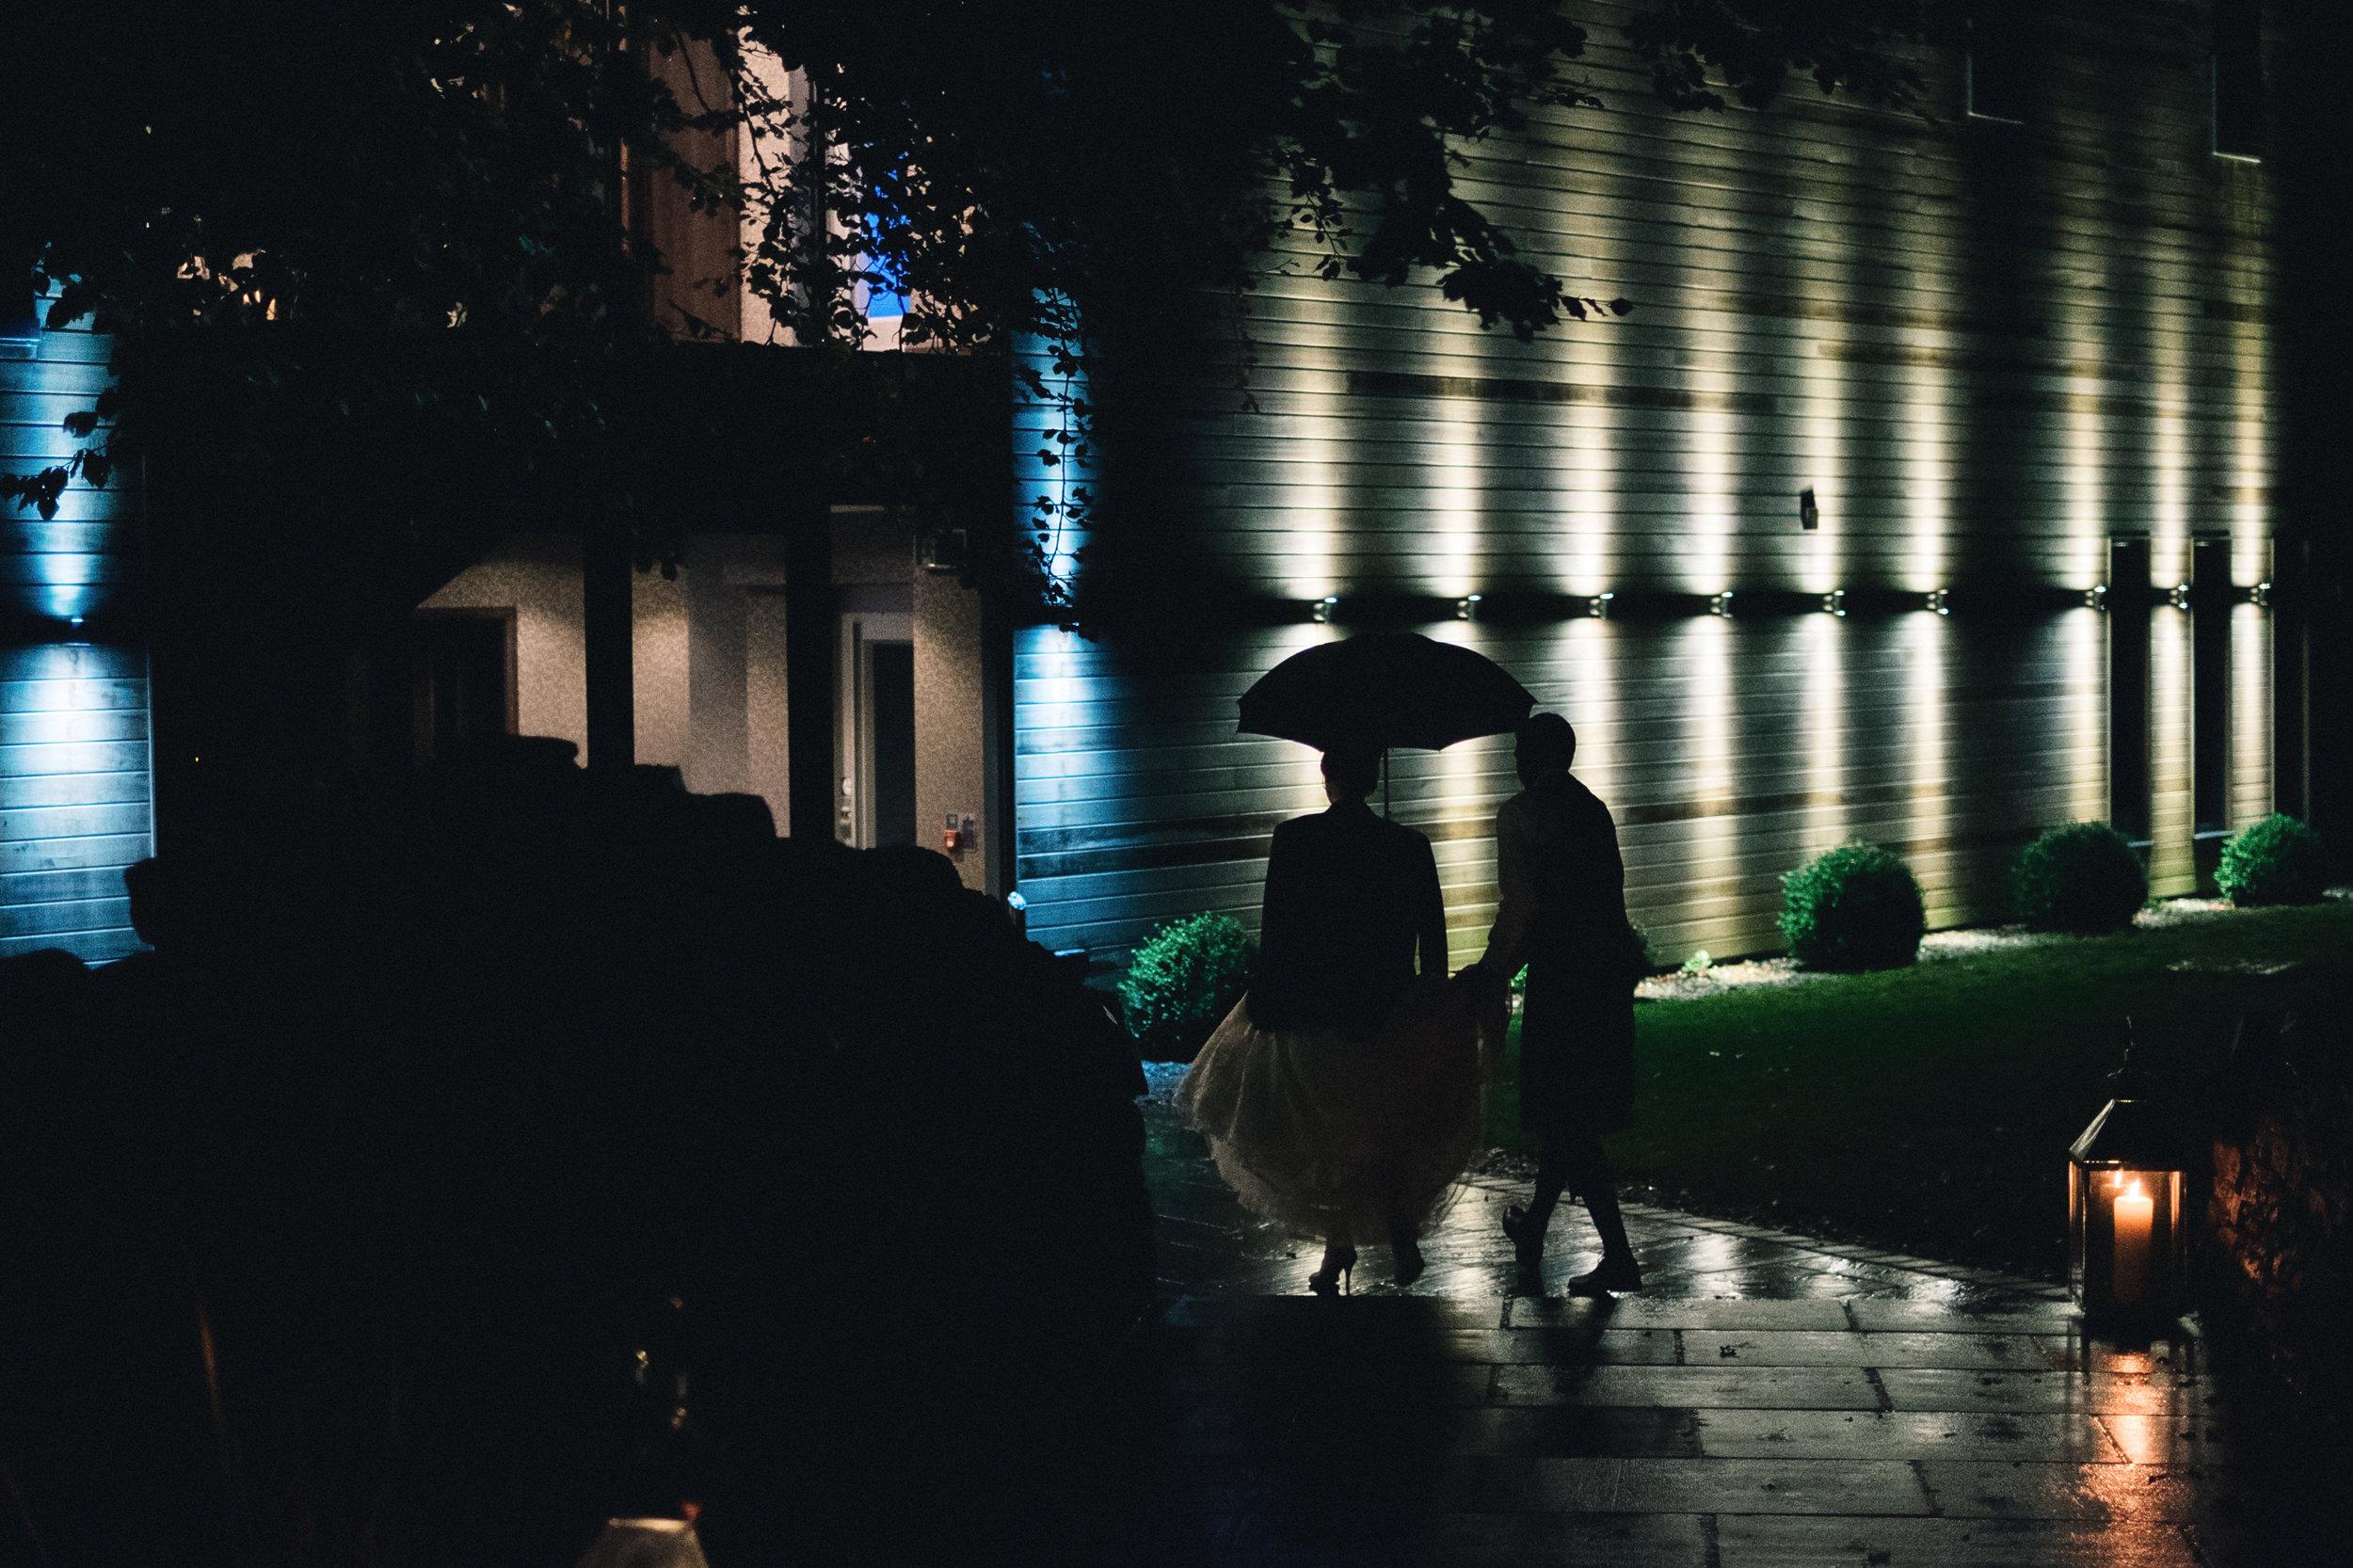 Bride and groom walk in the rain